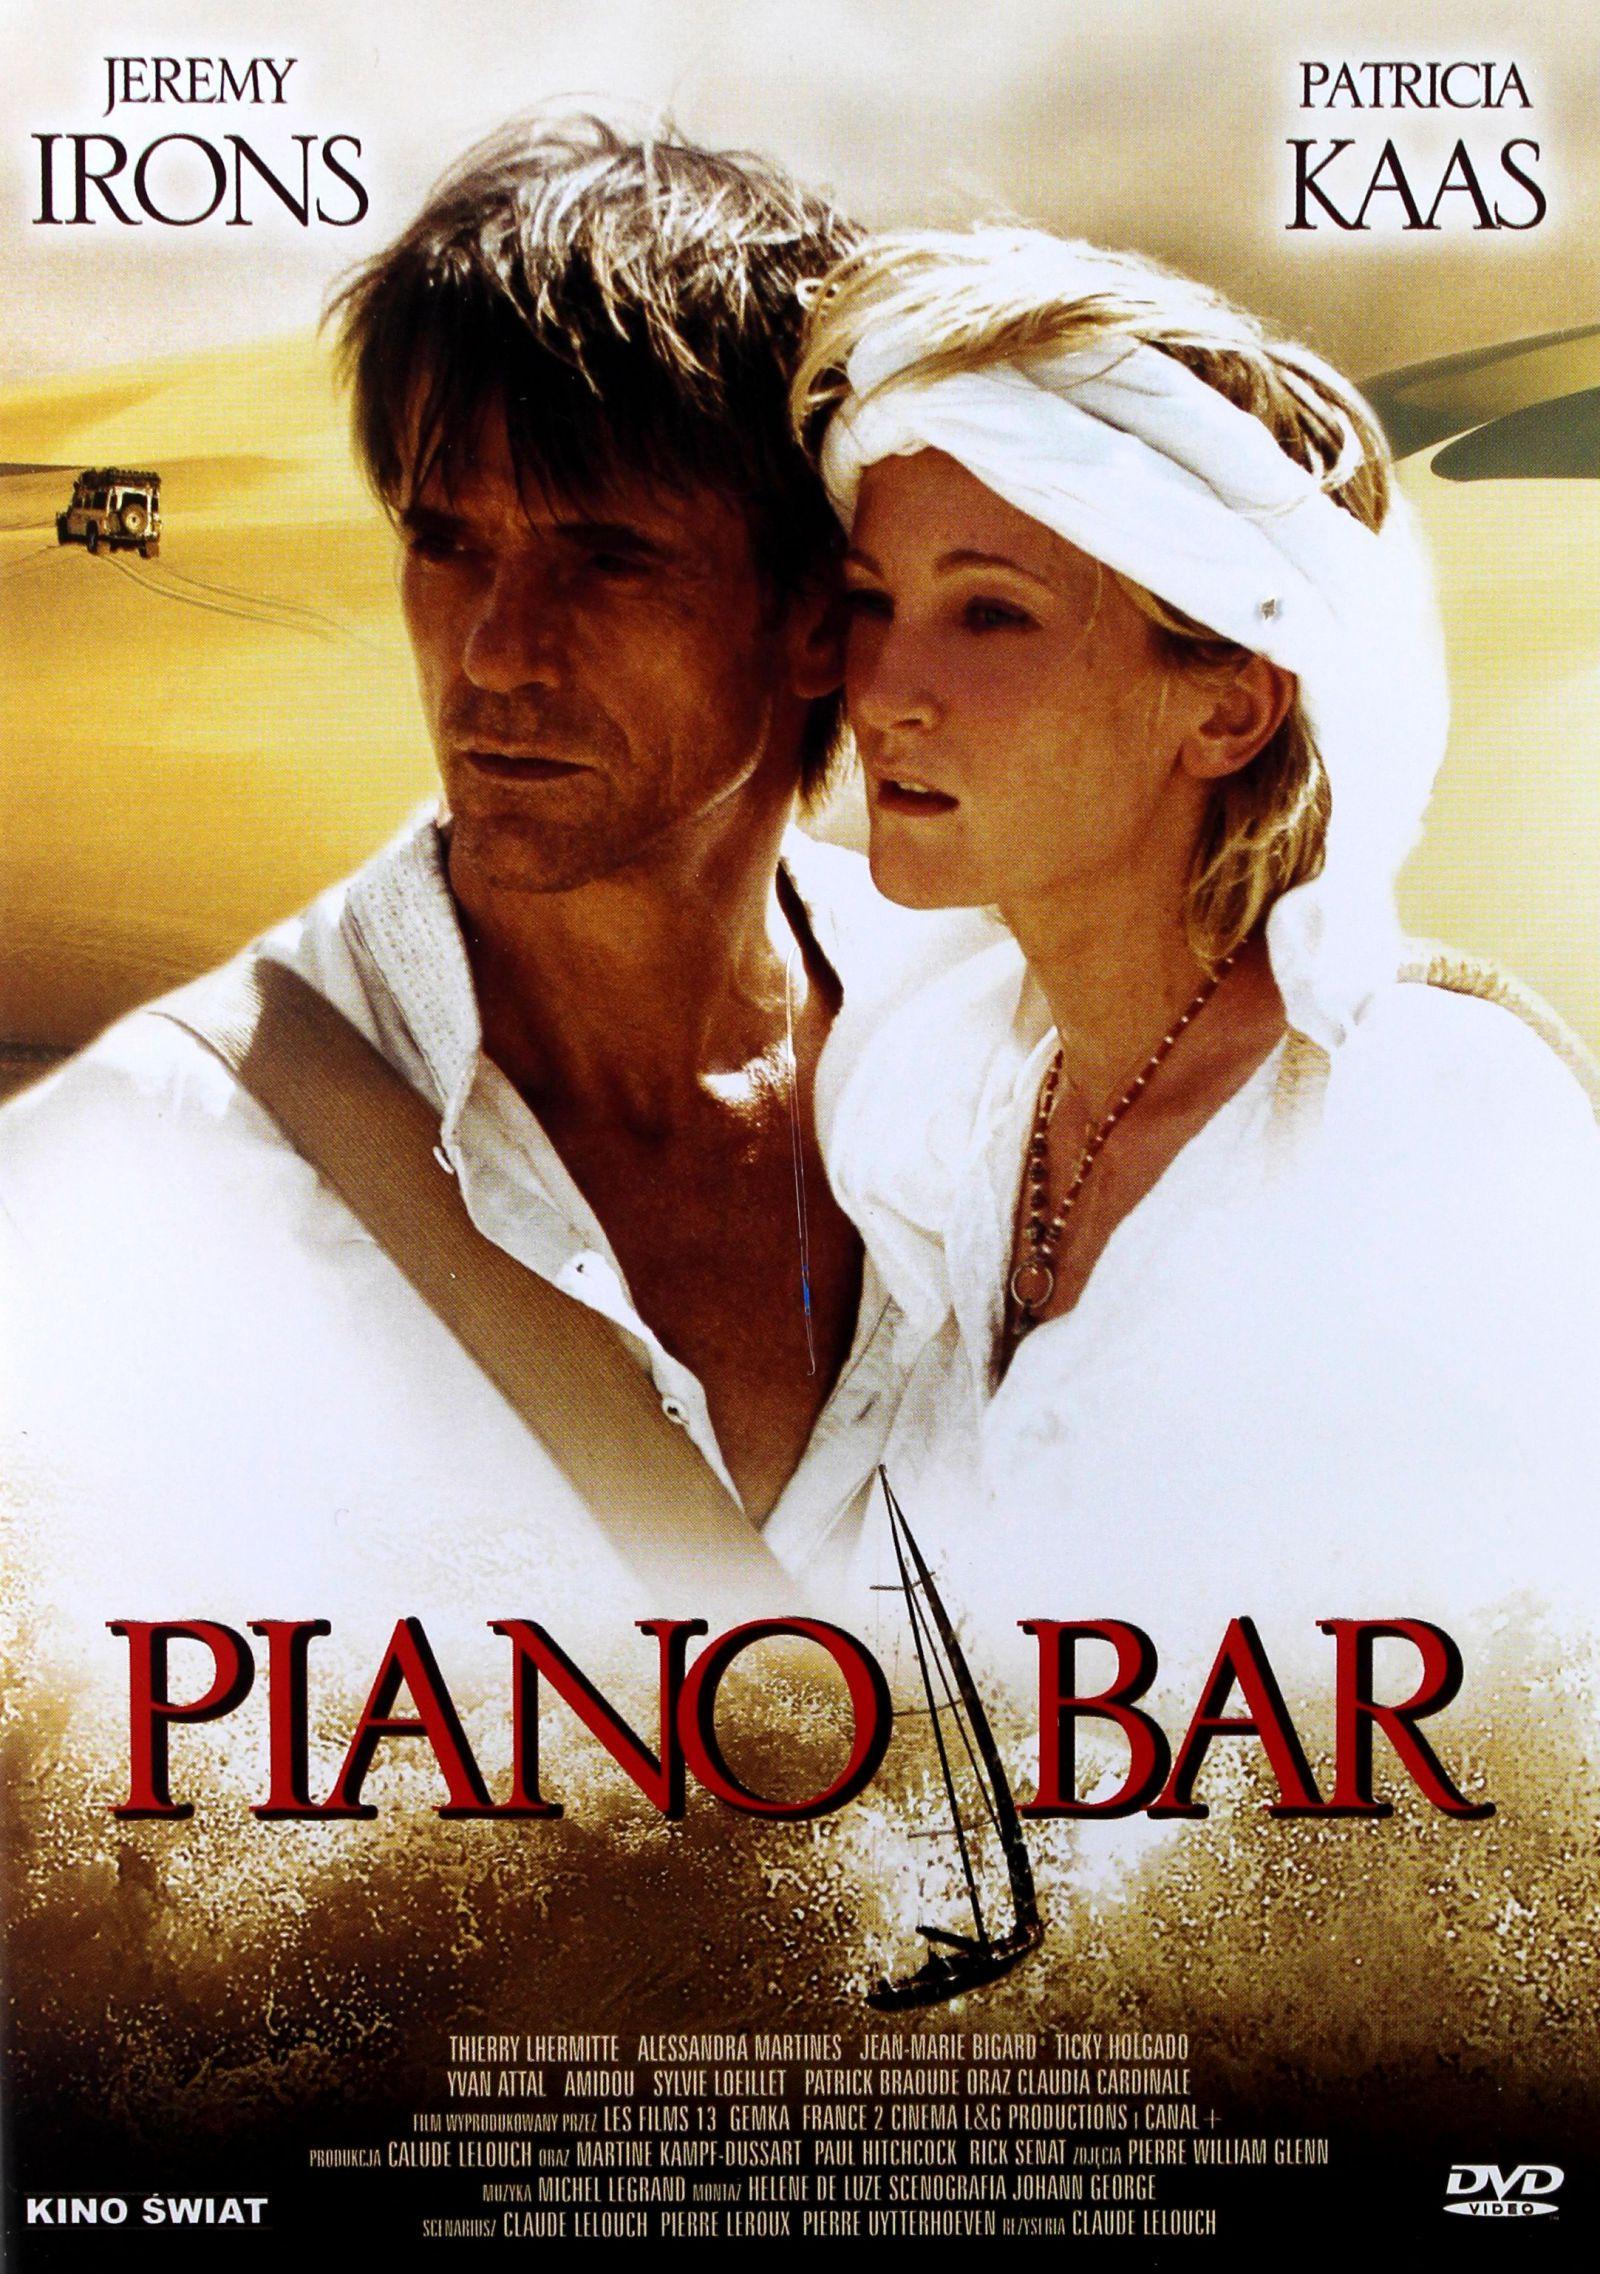 PIANO BAR [Jeremy Irons, Patricia Kaas] [DVD]